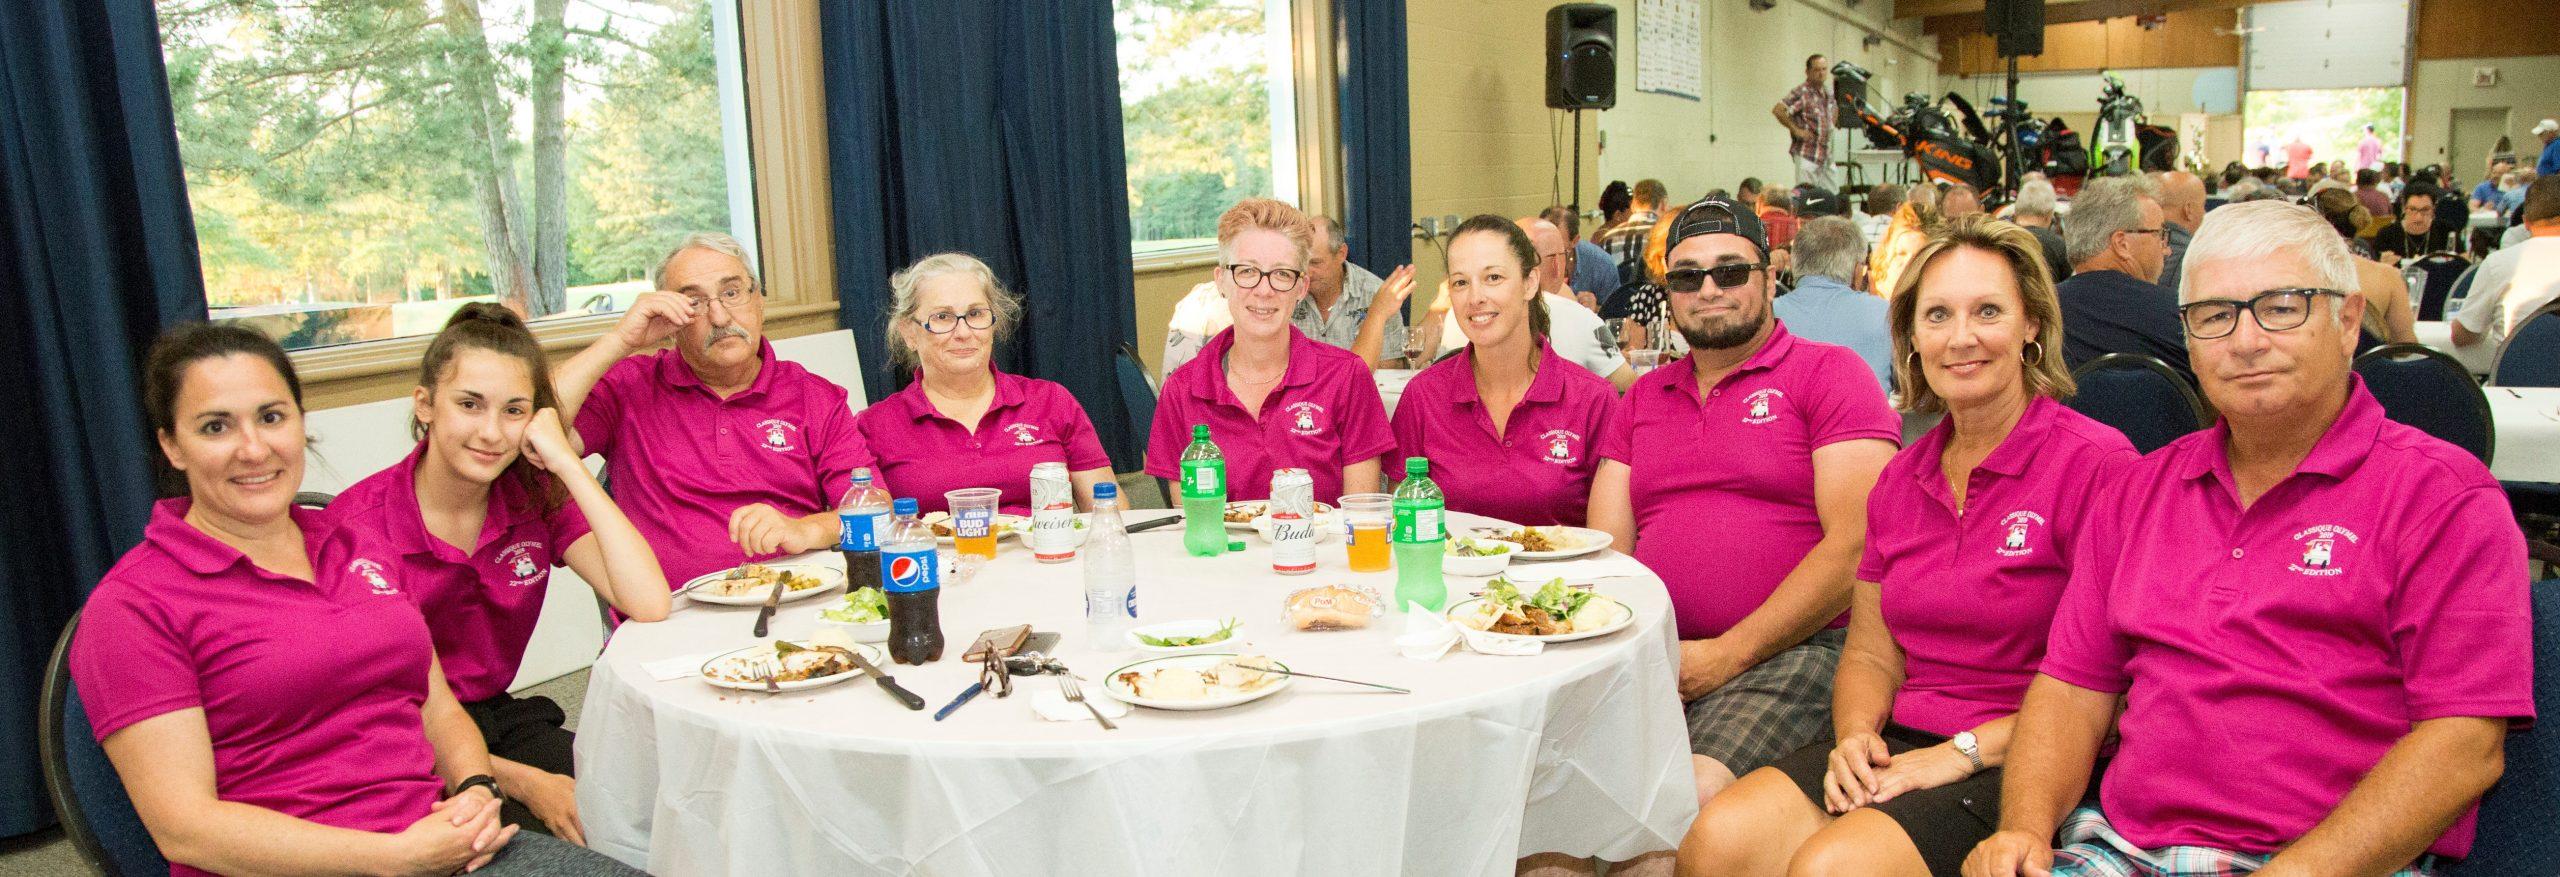 Bénévoles au tournoi de golf Olymel